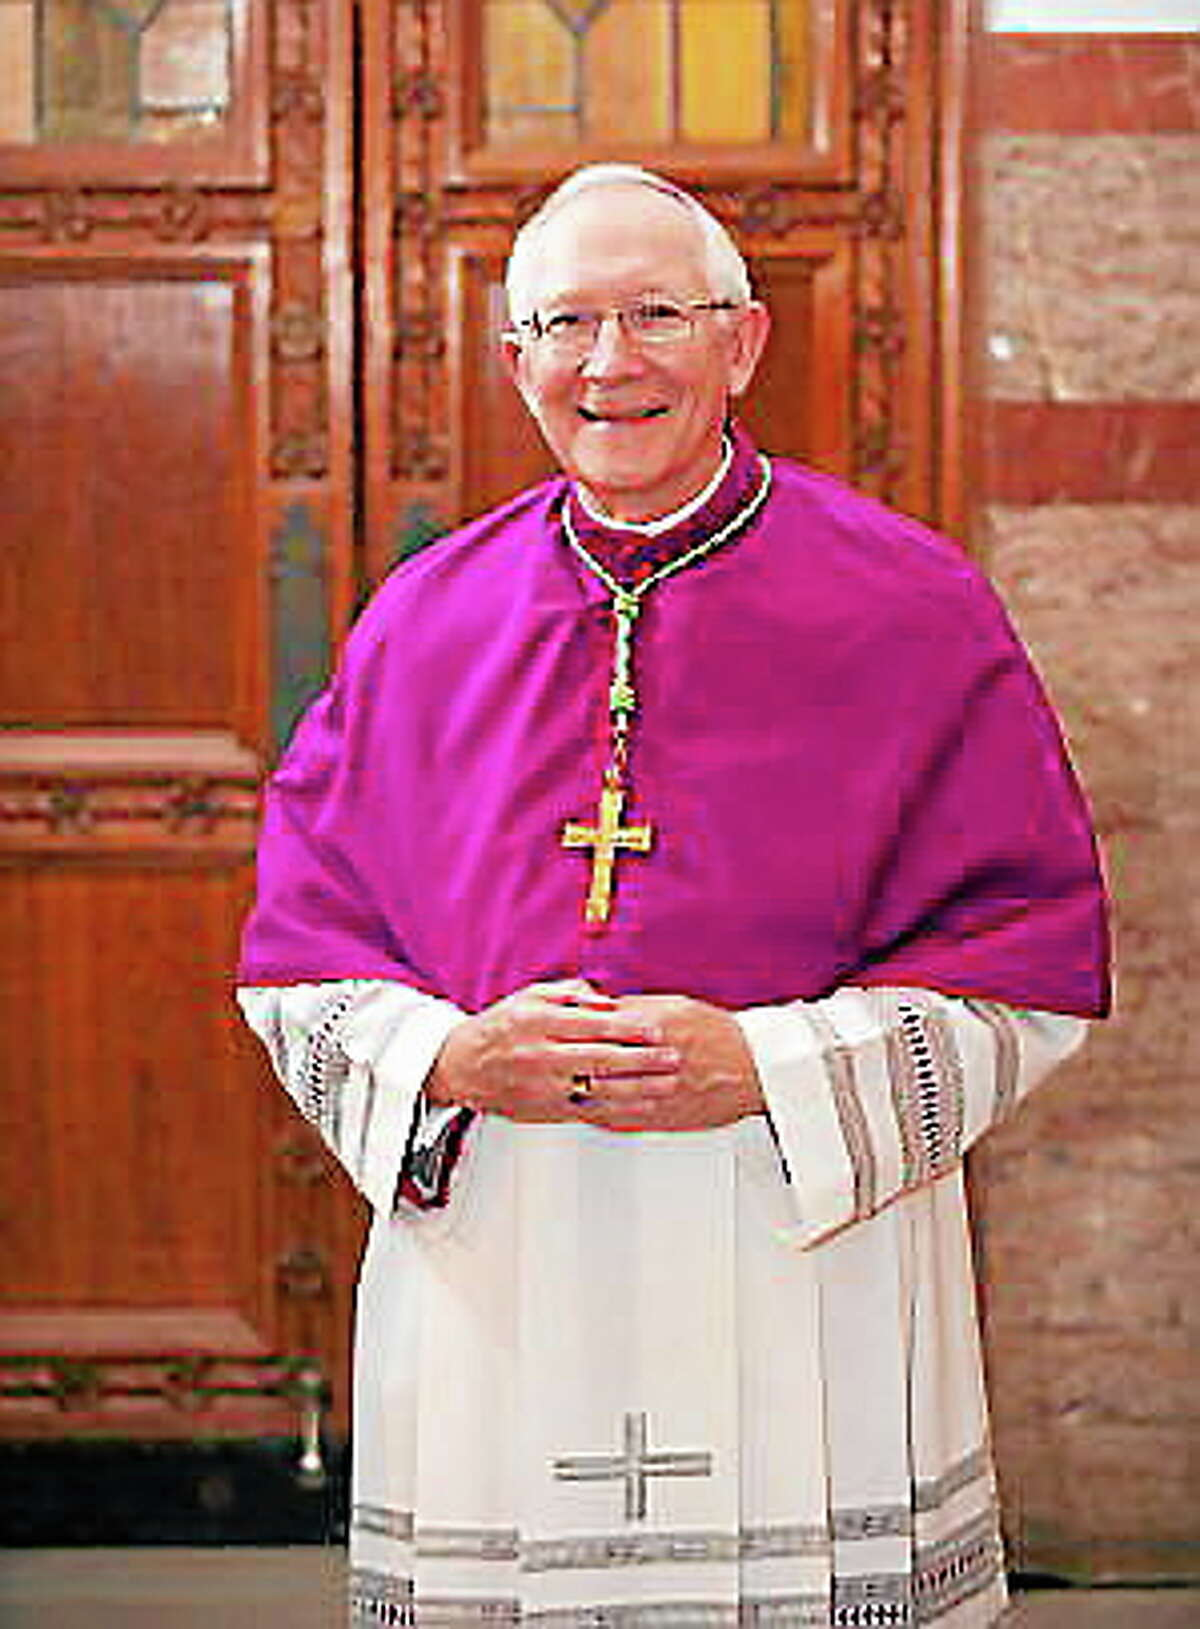 Leonard P. Blair, archbishop of the Archdiocese of Hartford